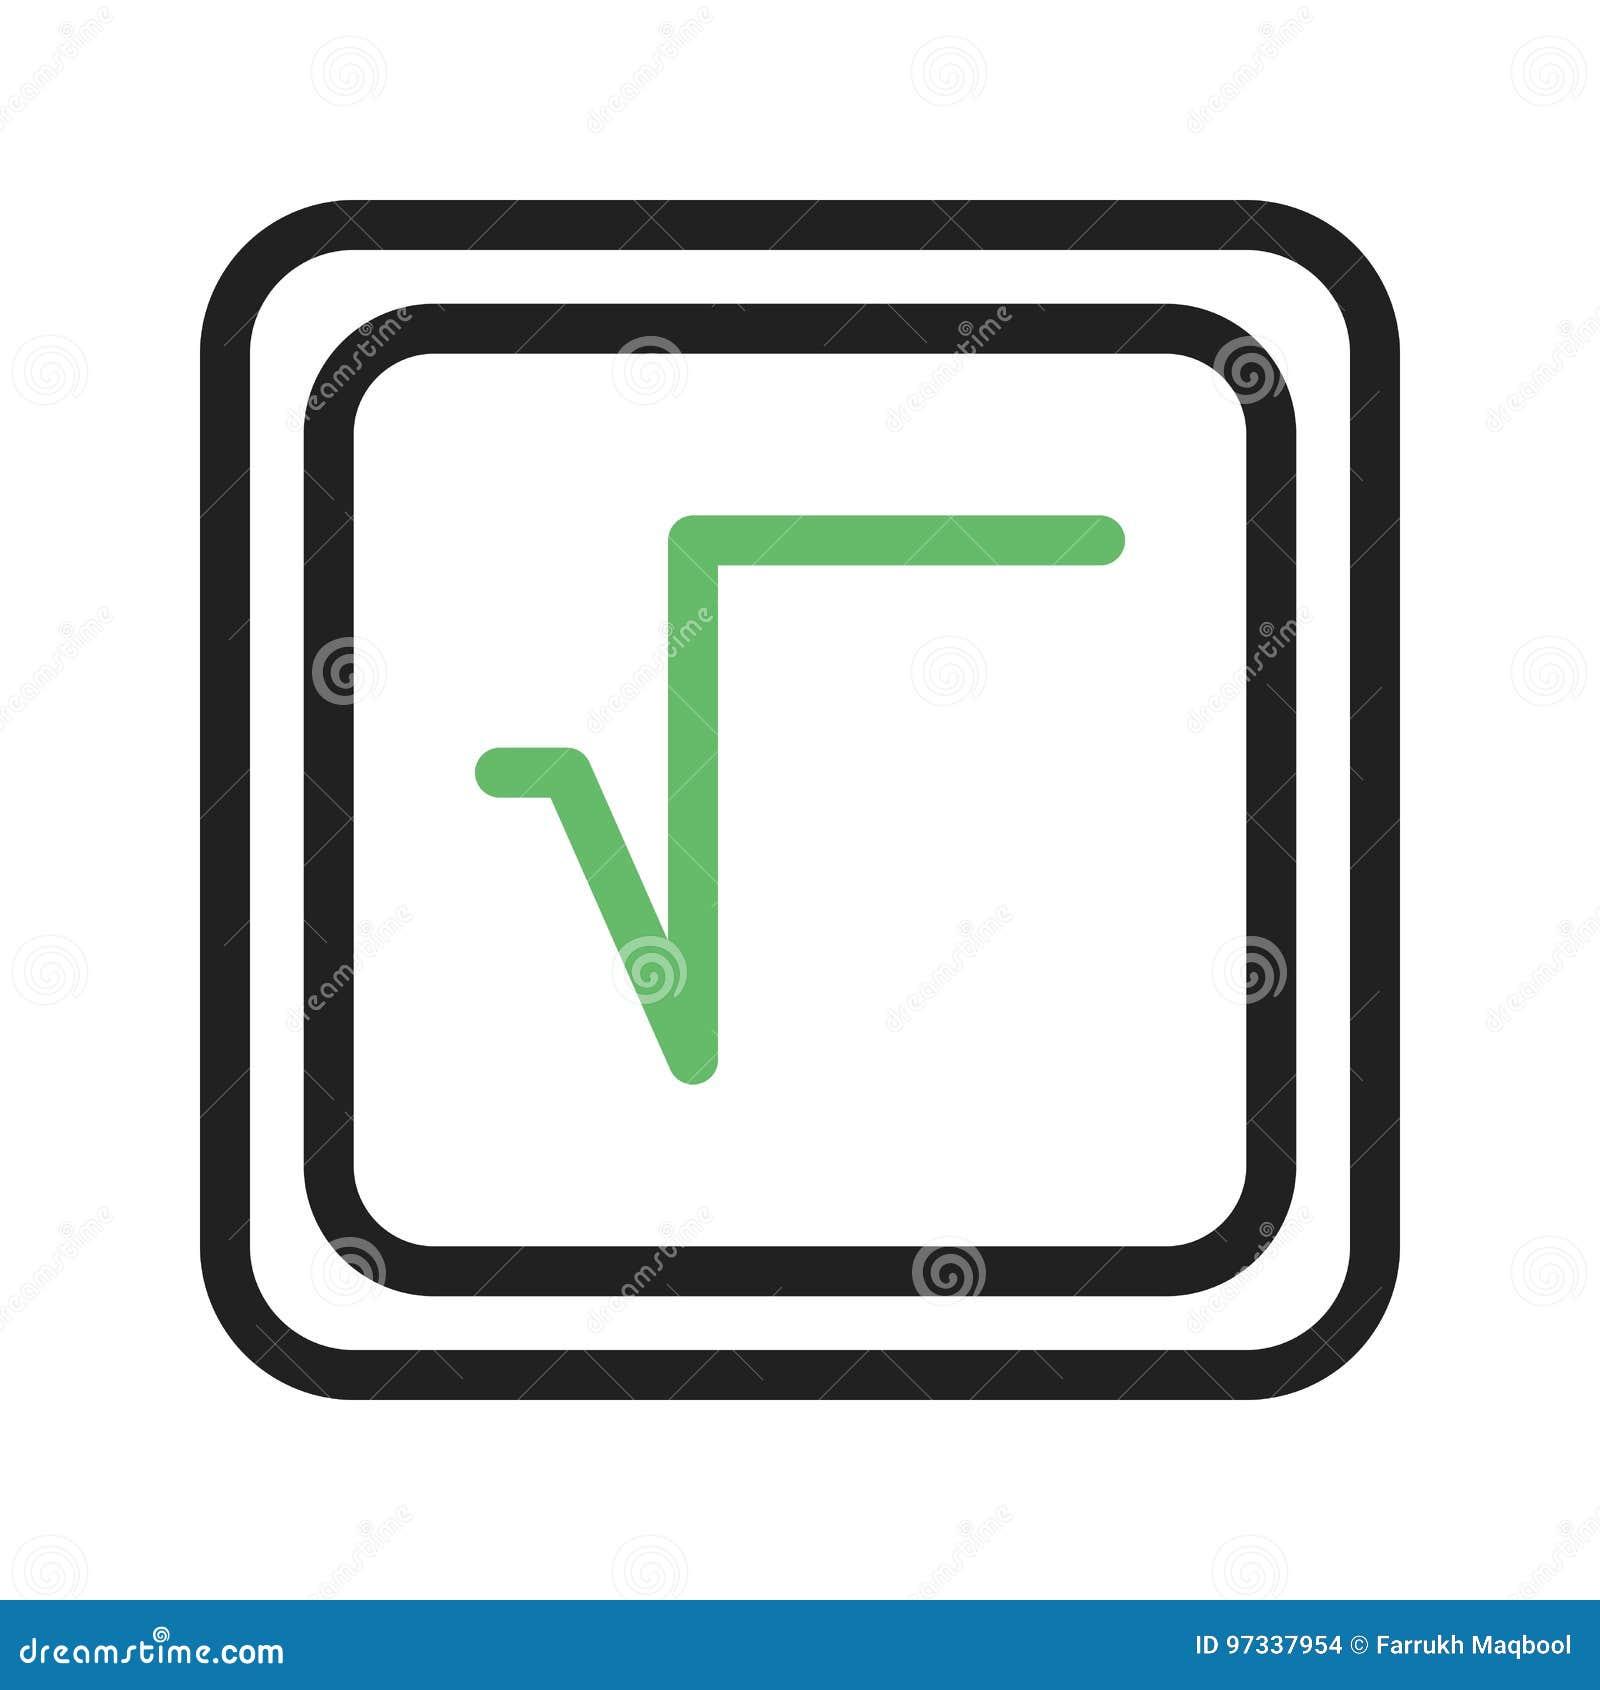 Square Root Symbol Stock Illustration Illustration Of Maths 97337954